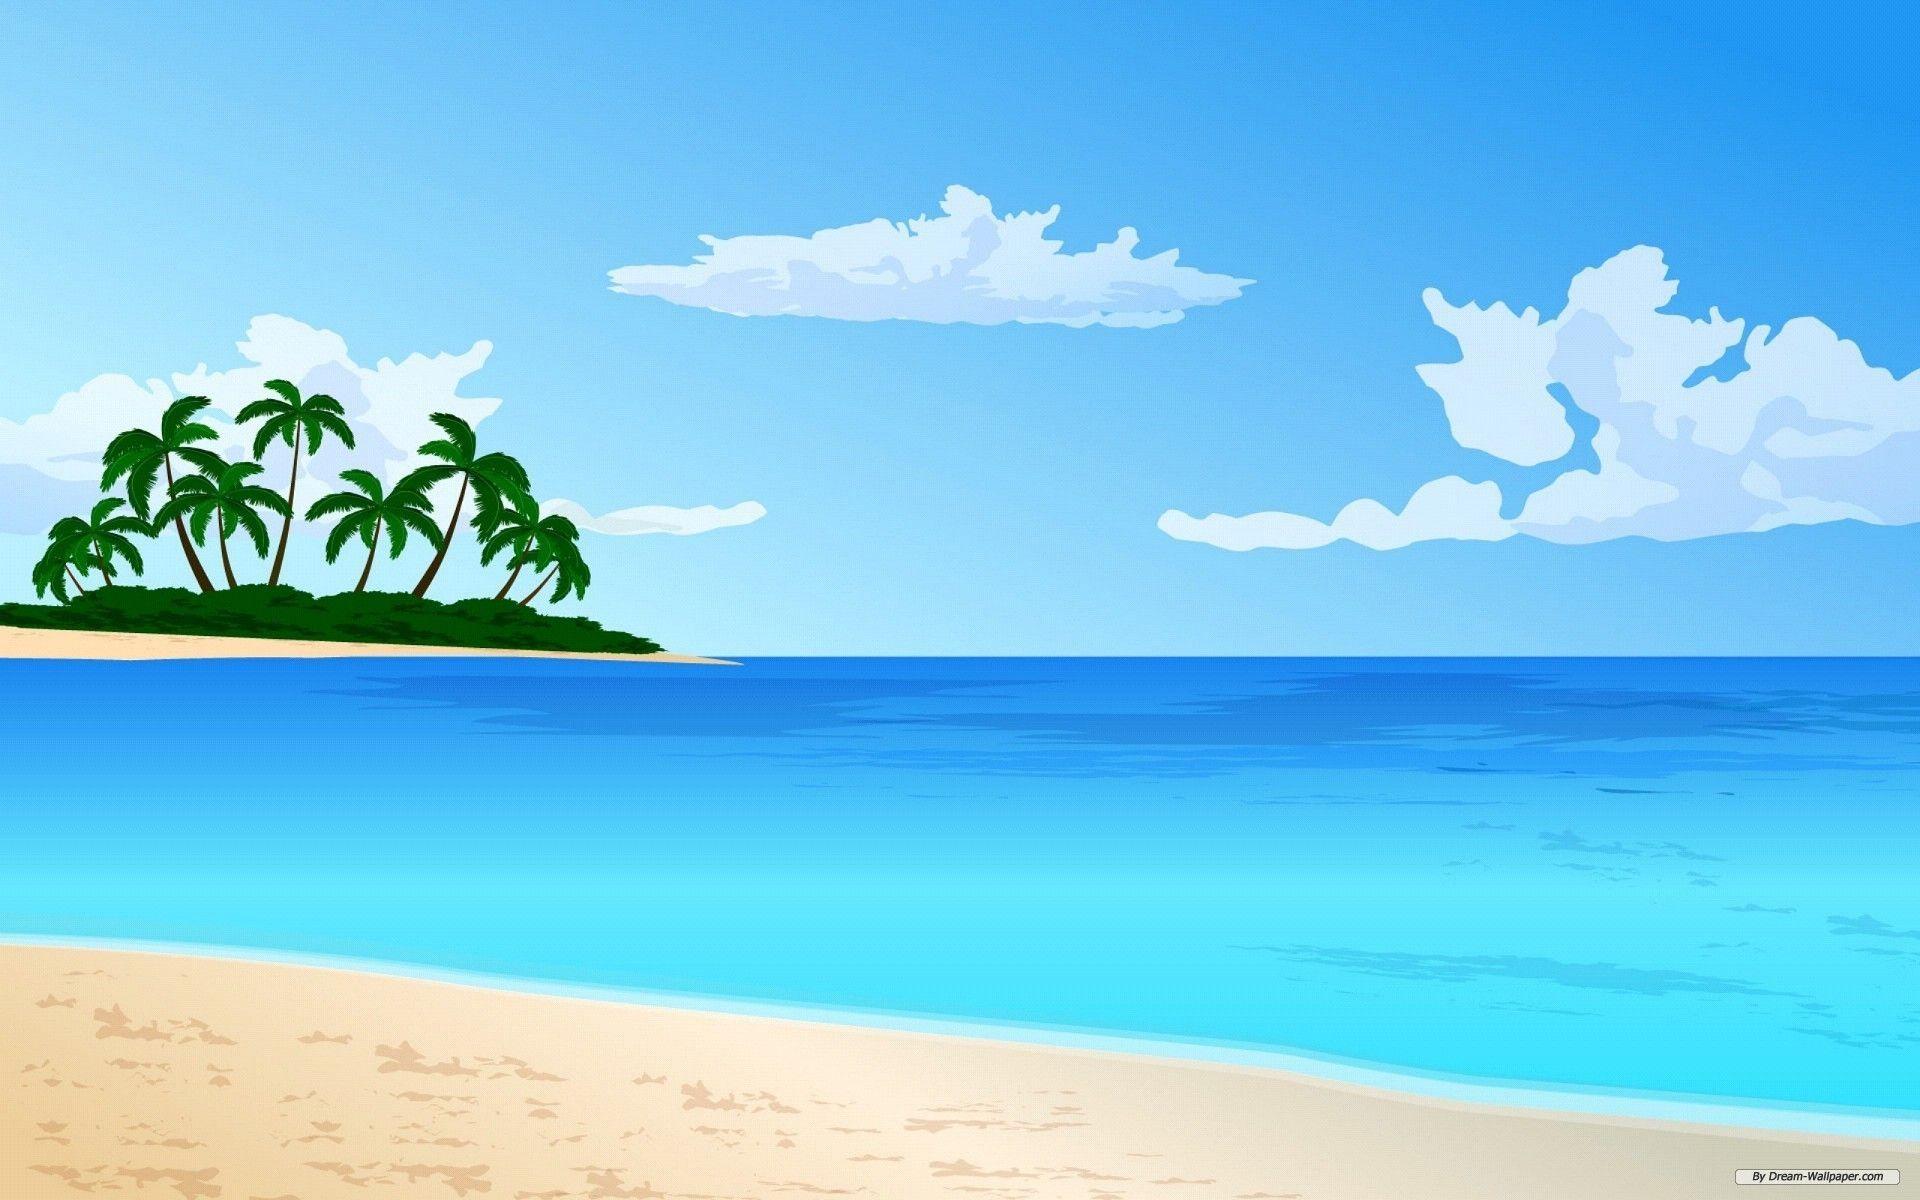 Beach clipart beach scene. Wallpaper hdwallsdeks pinterest background